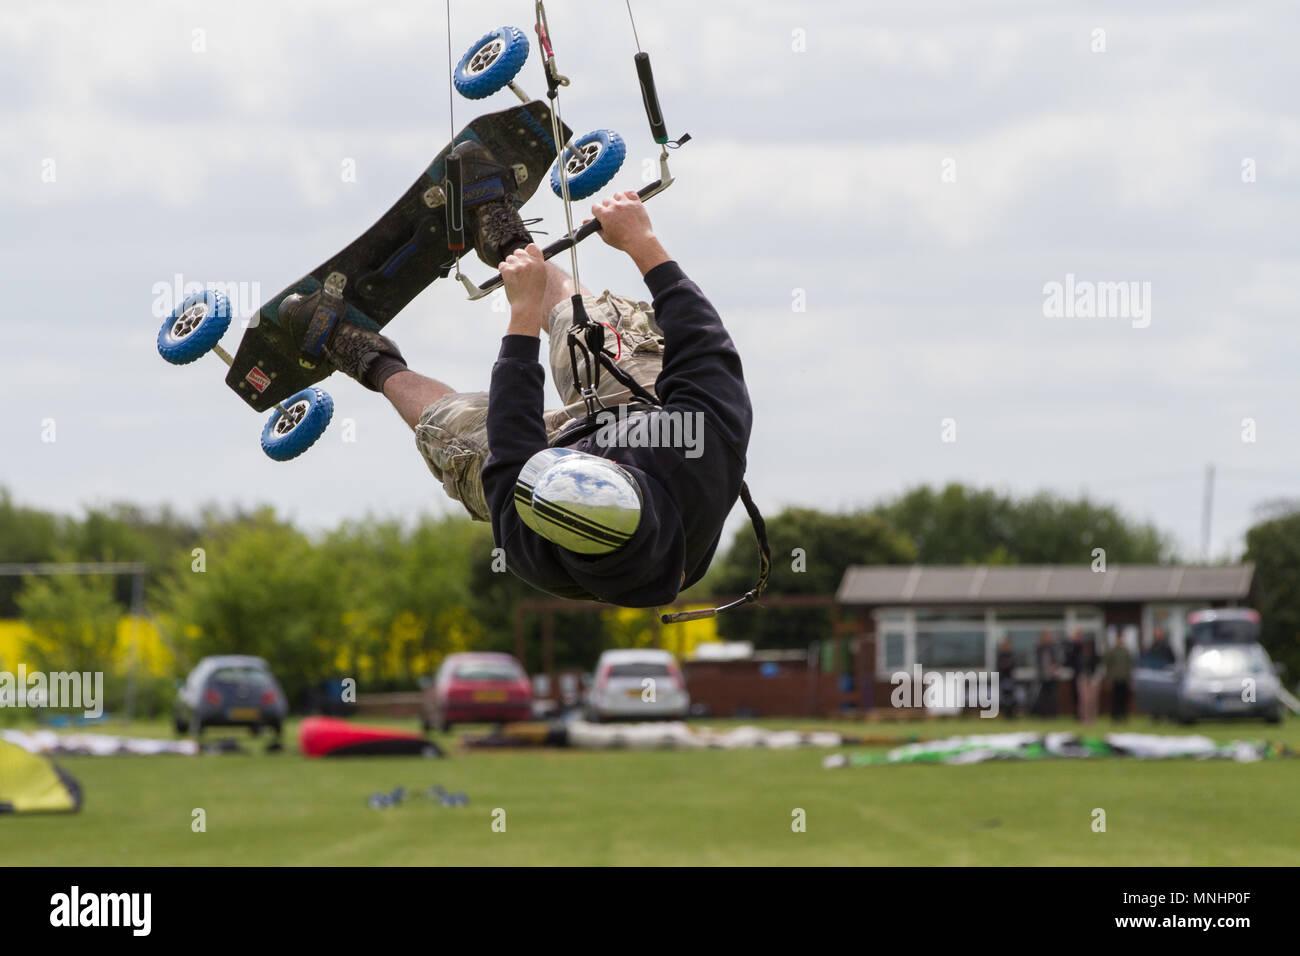 Extreme sport kite landboarding in Essex, UK. Upside down whilst airborne. Stock Photo